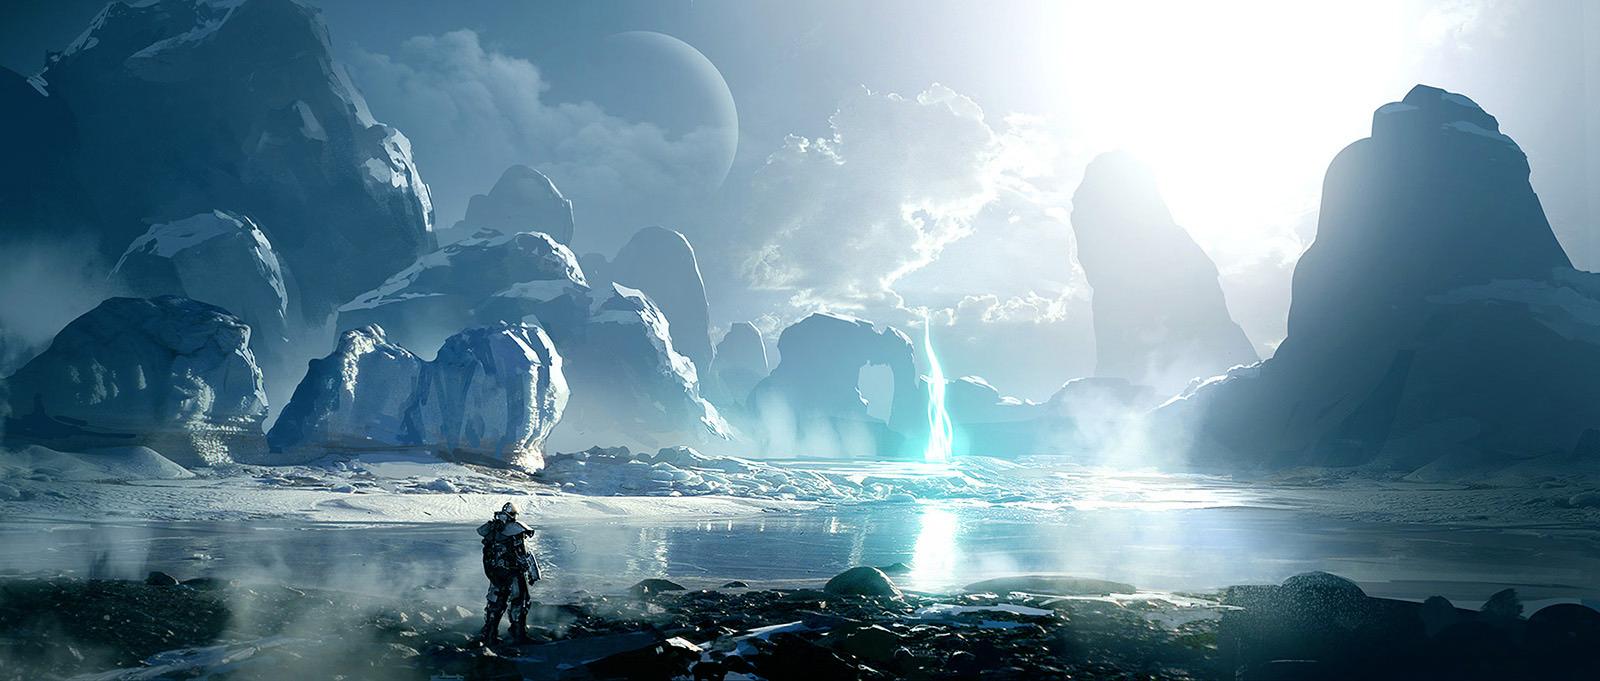 File:Sci Fi Art Layne Johnson Ice Planet on Latest Creative Writing Prompts 2